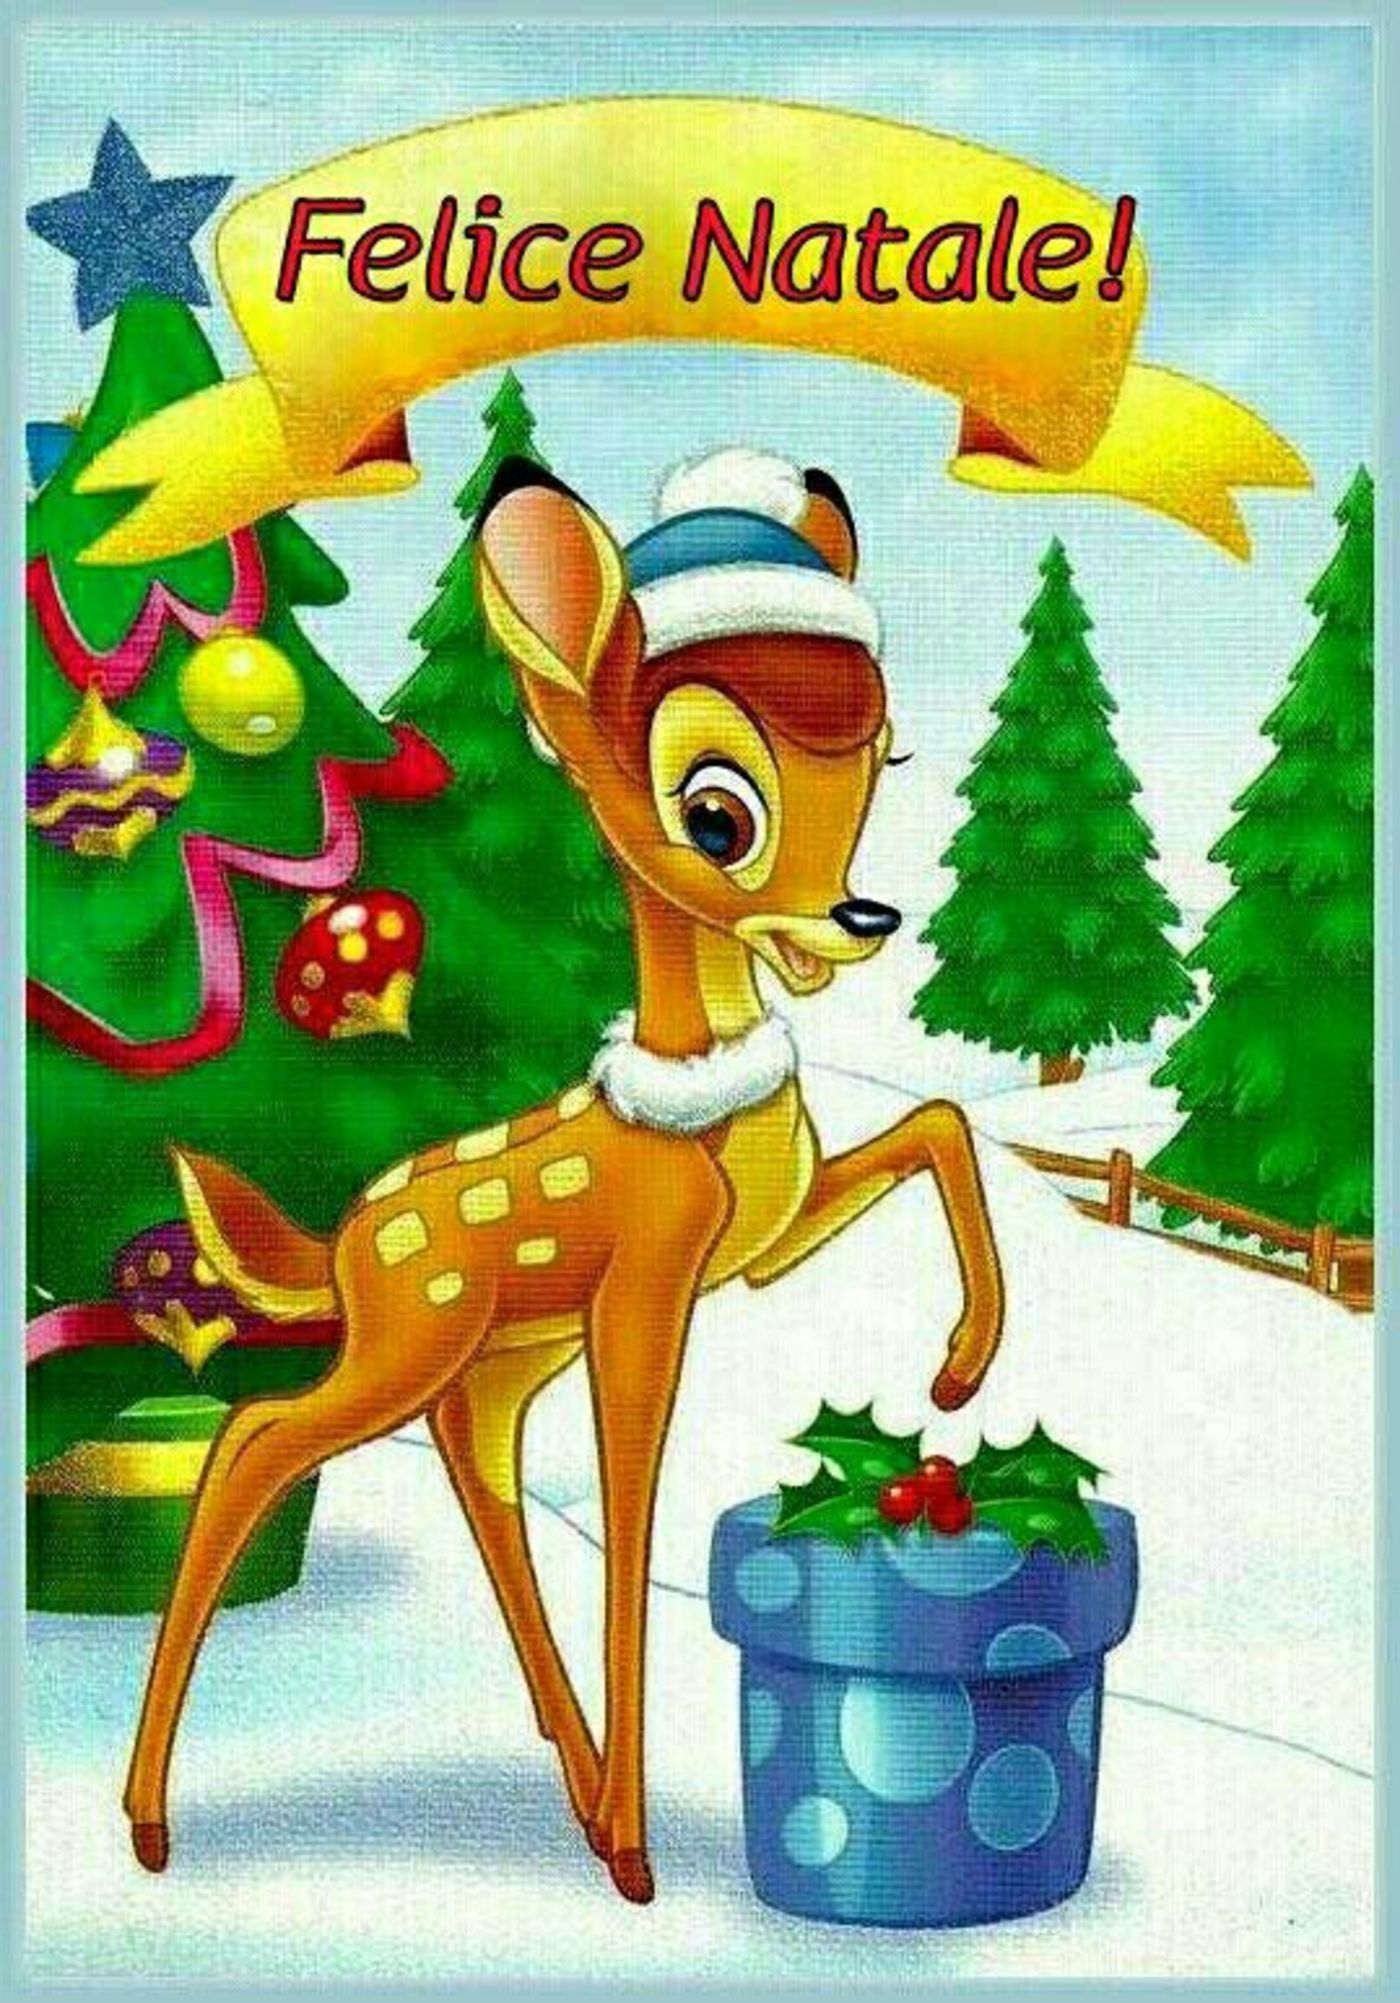 Auguri Di Natale Disney.Felice Natale Disney Auguri Di Buon Natale Disney Christmas